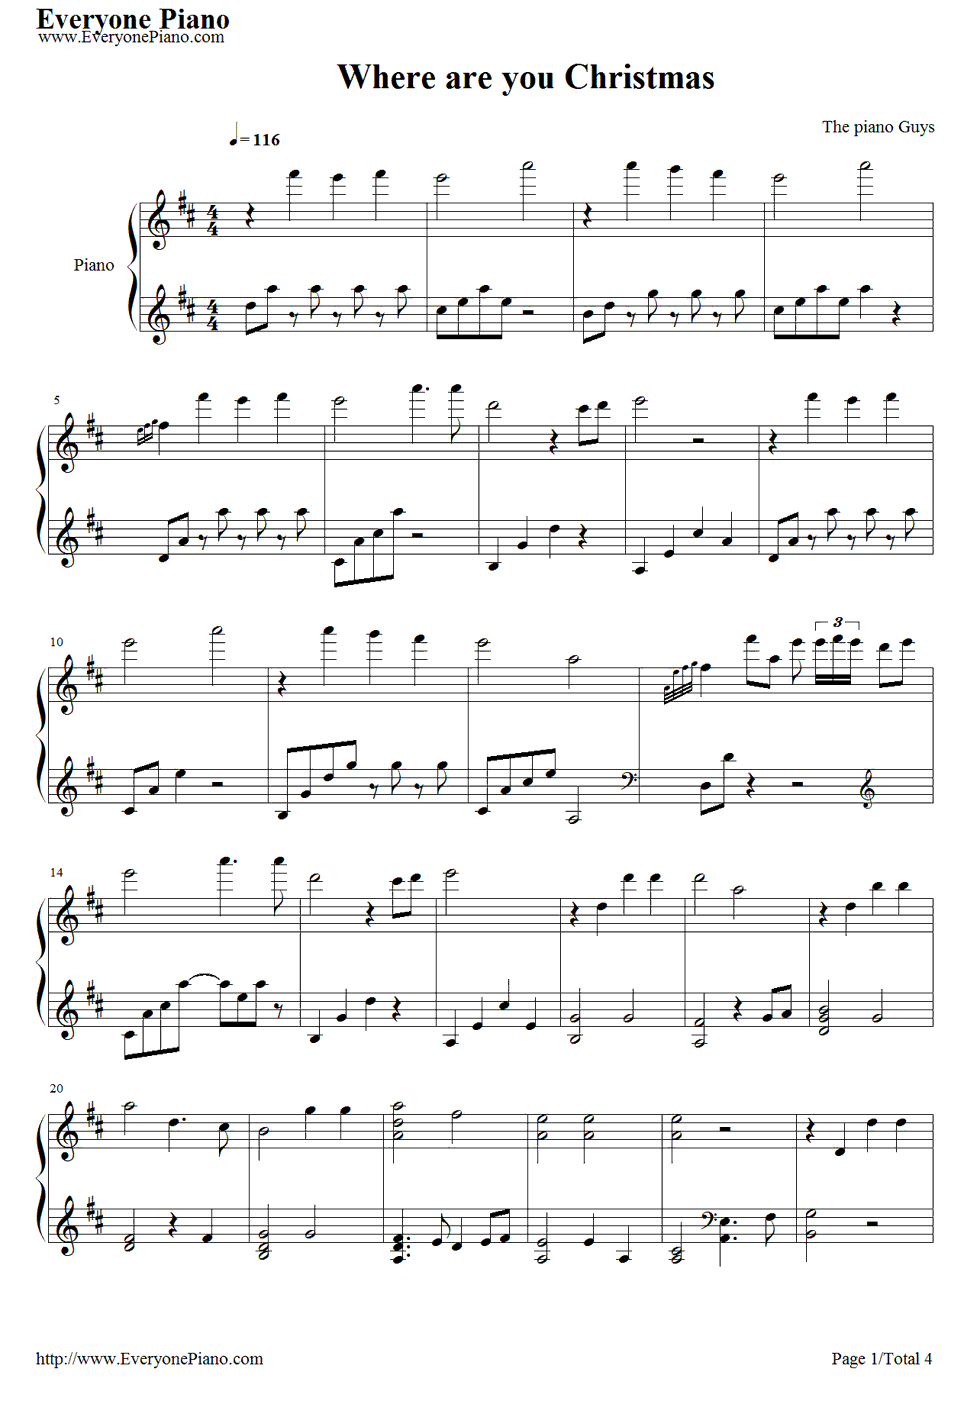 Free Where Are You Christmas-The Piano Guys Sheet Music Preview 1 - Christmas Music For Piano Free Printable